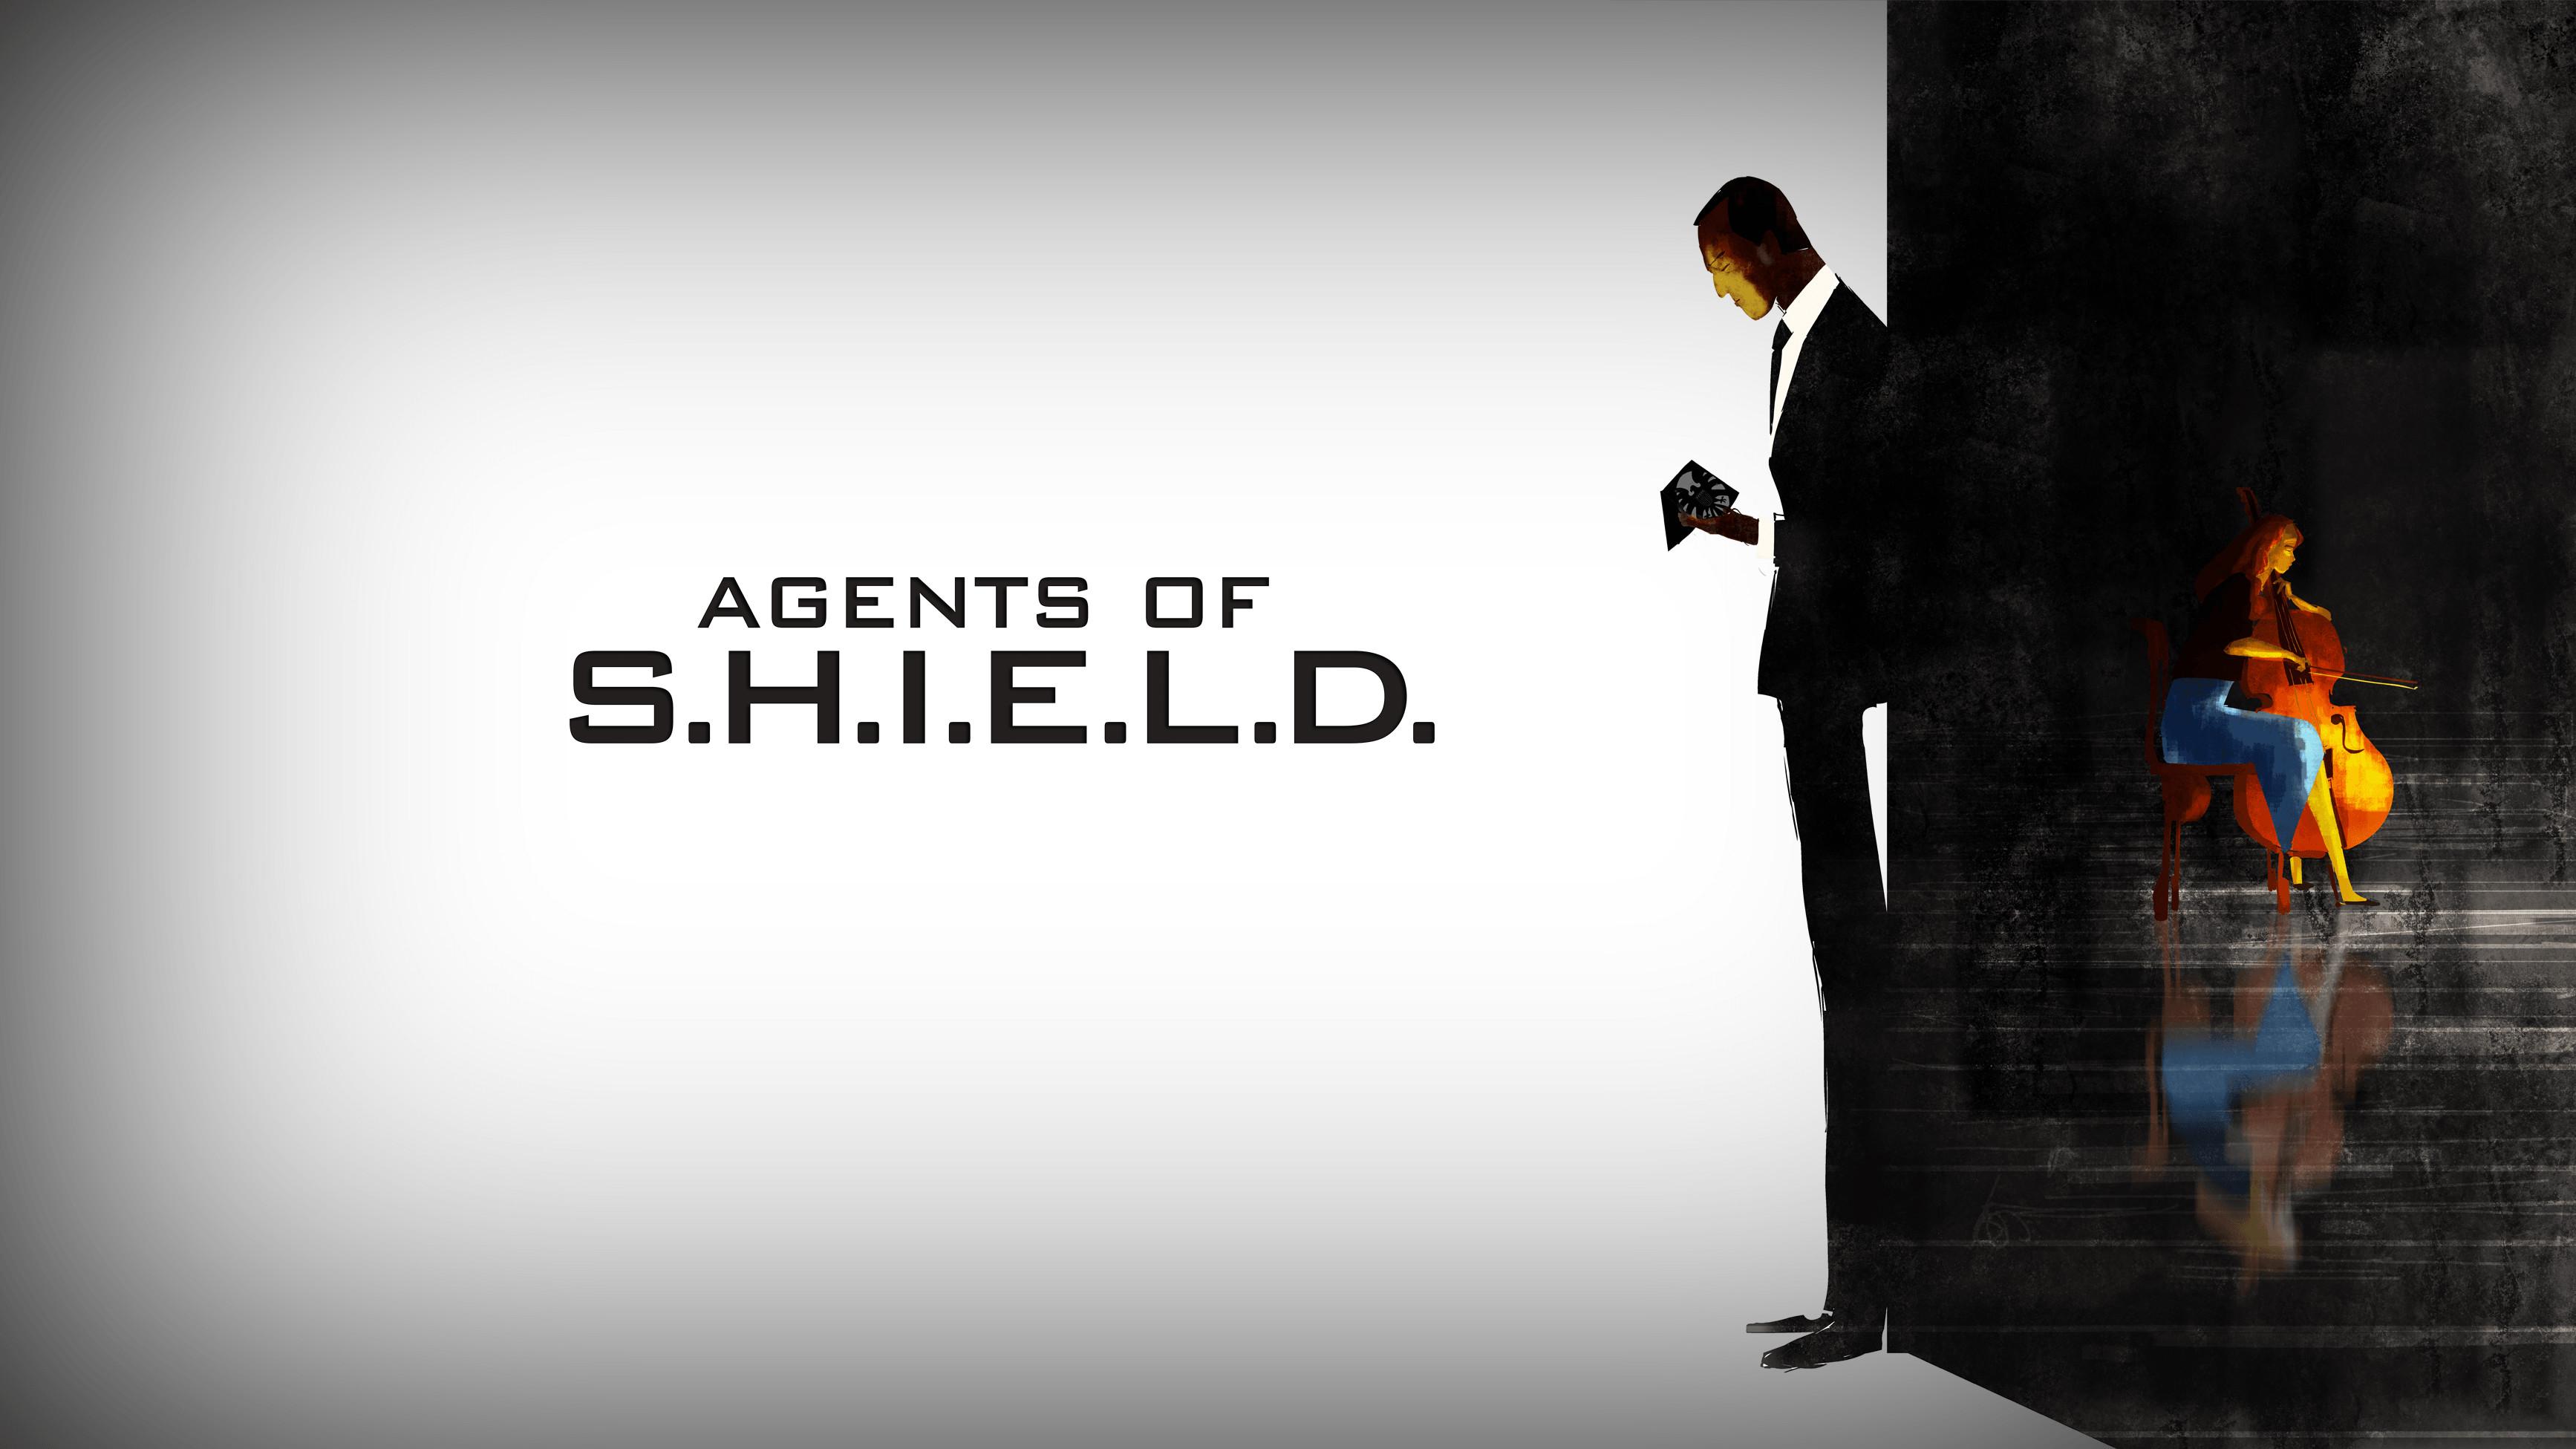 8 Agents Of S.H.I.E.L.D. HD Wallpapers